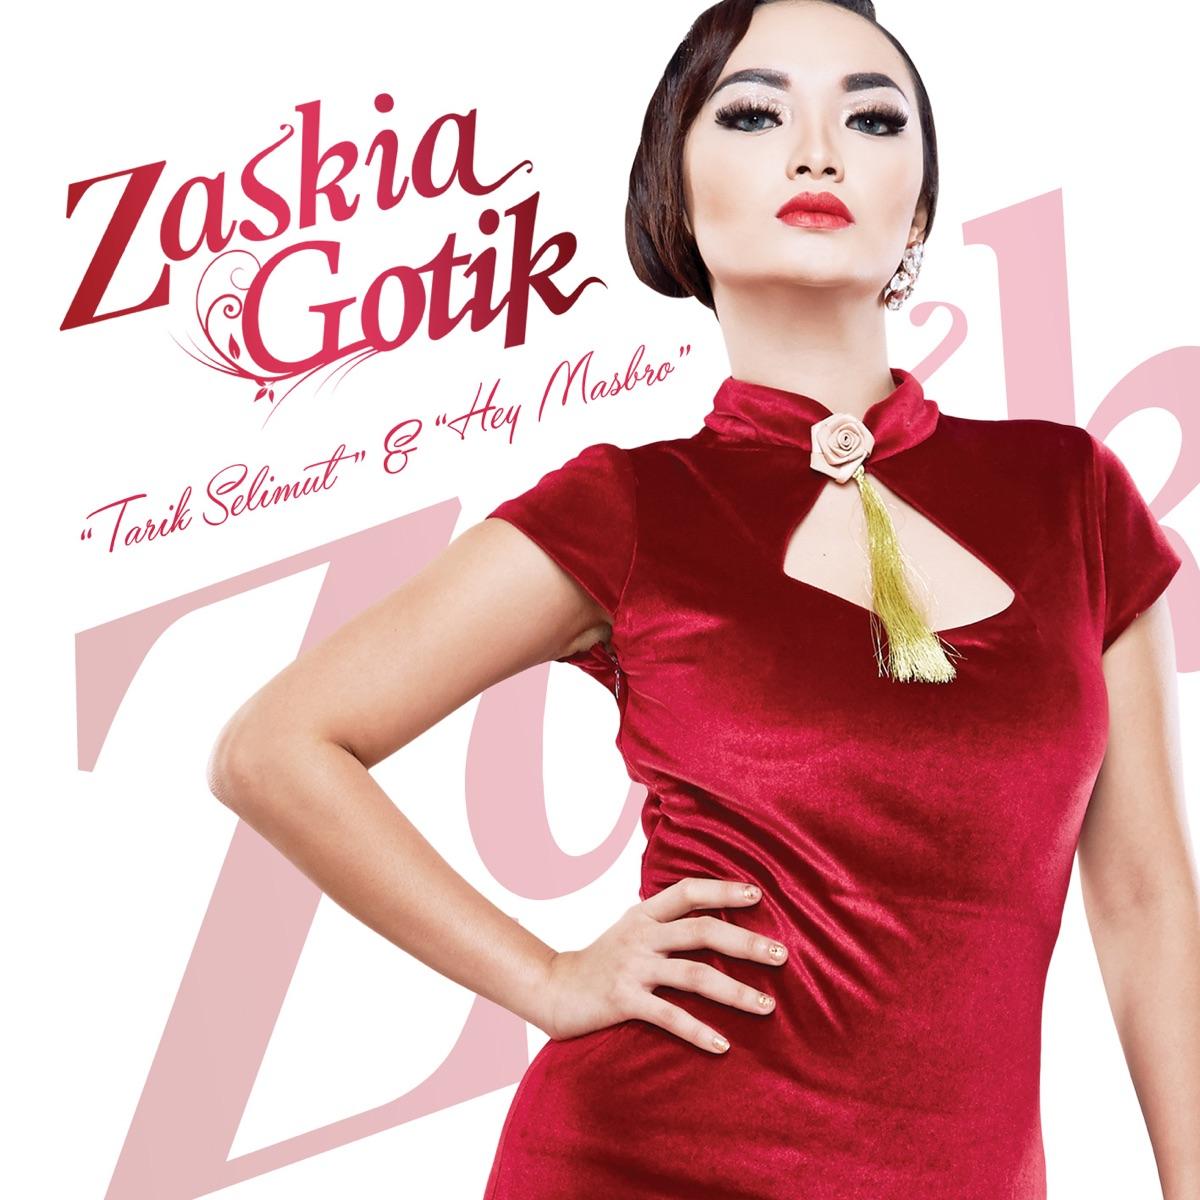 Zaskia gotik album cover by zaskia gotik hot albums by zaskia gotik reheart Image collections